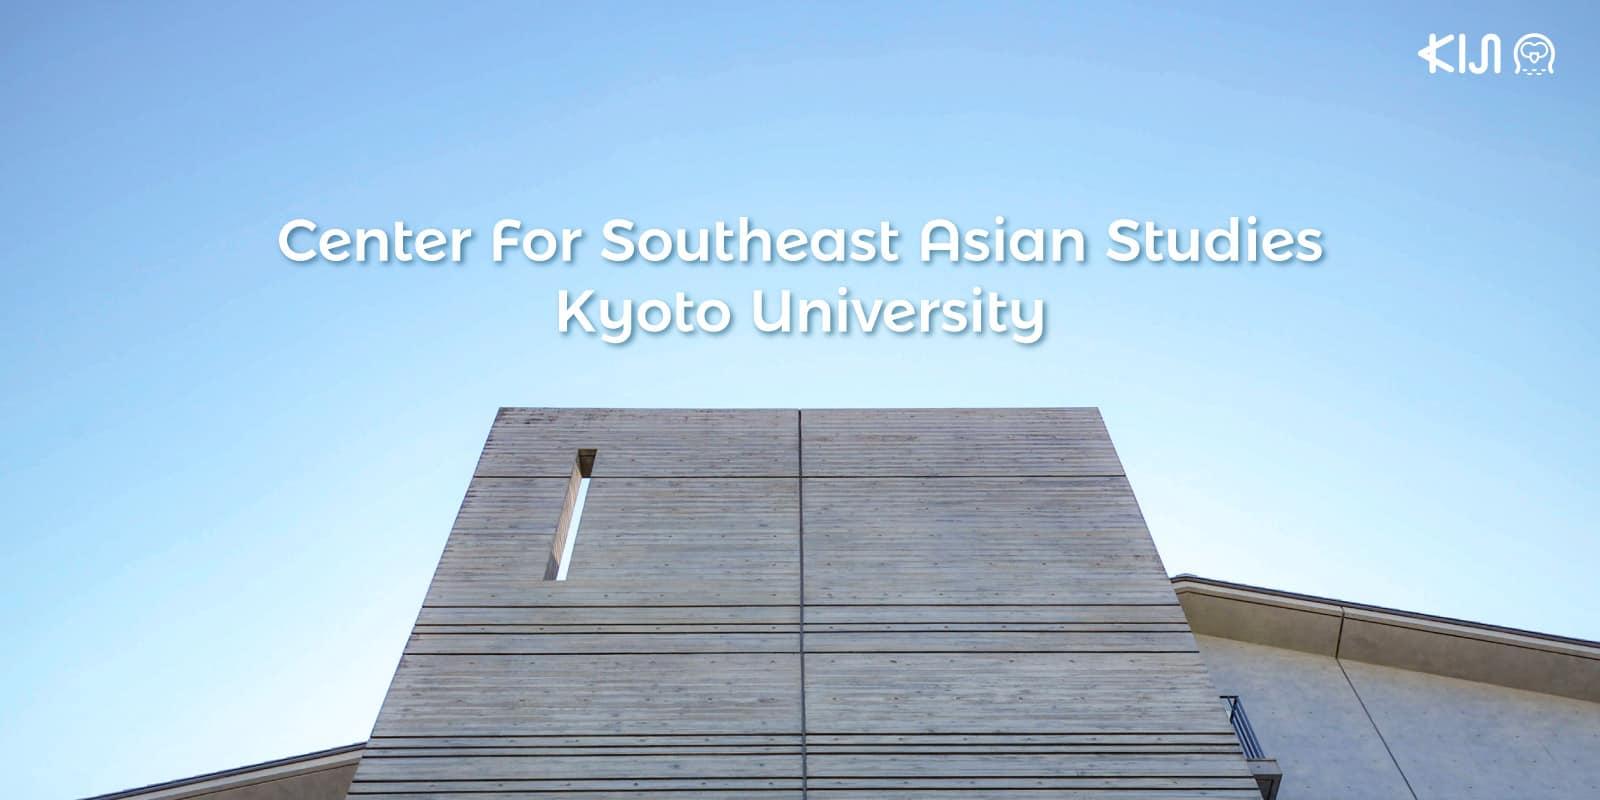 Center For Southeast Asian Studies